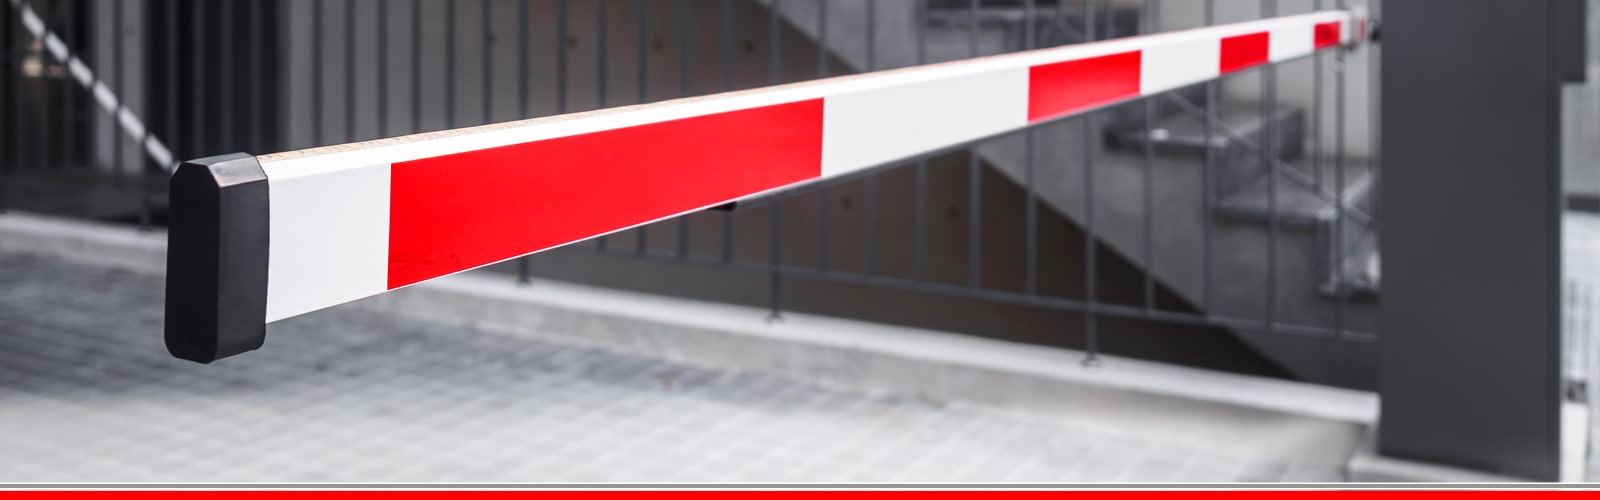 barrier-arm-gate